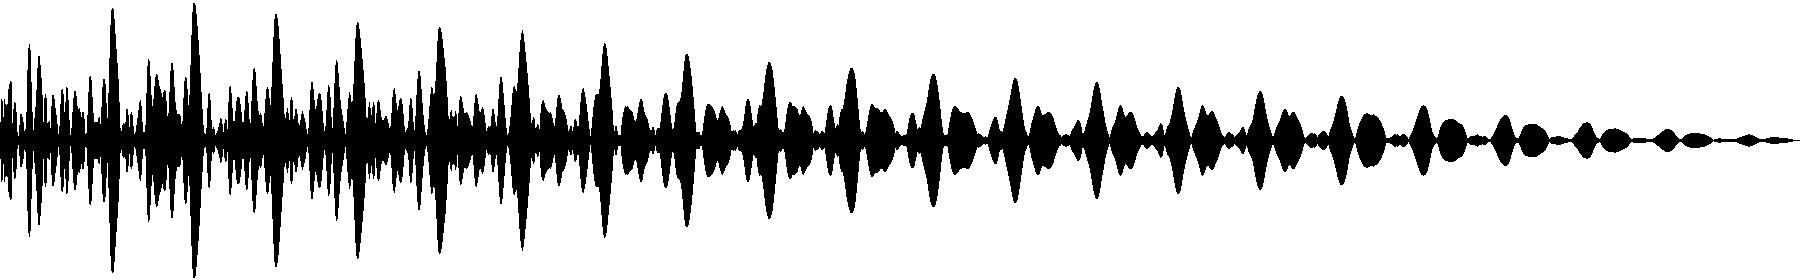 vedh bass cut 039 g